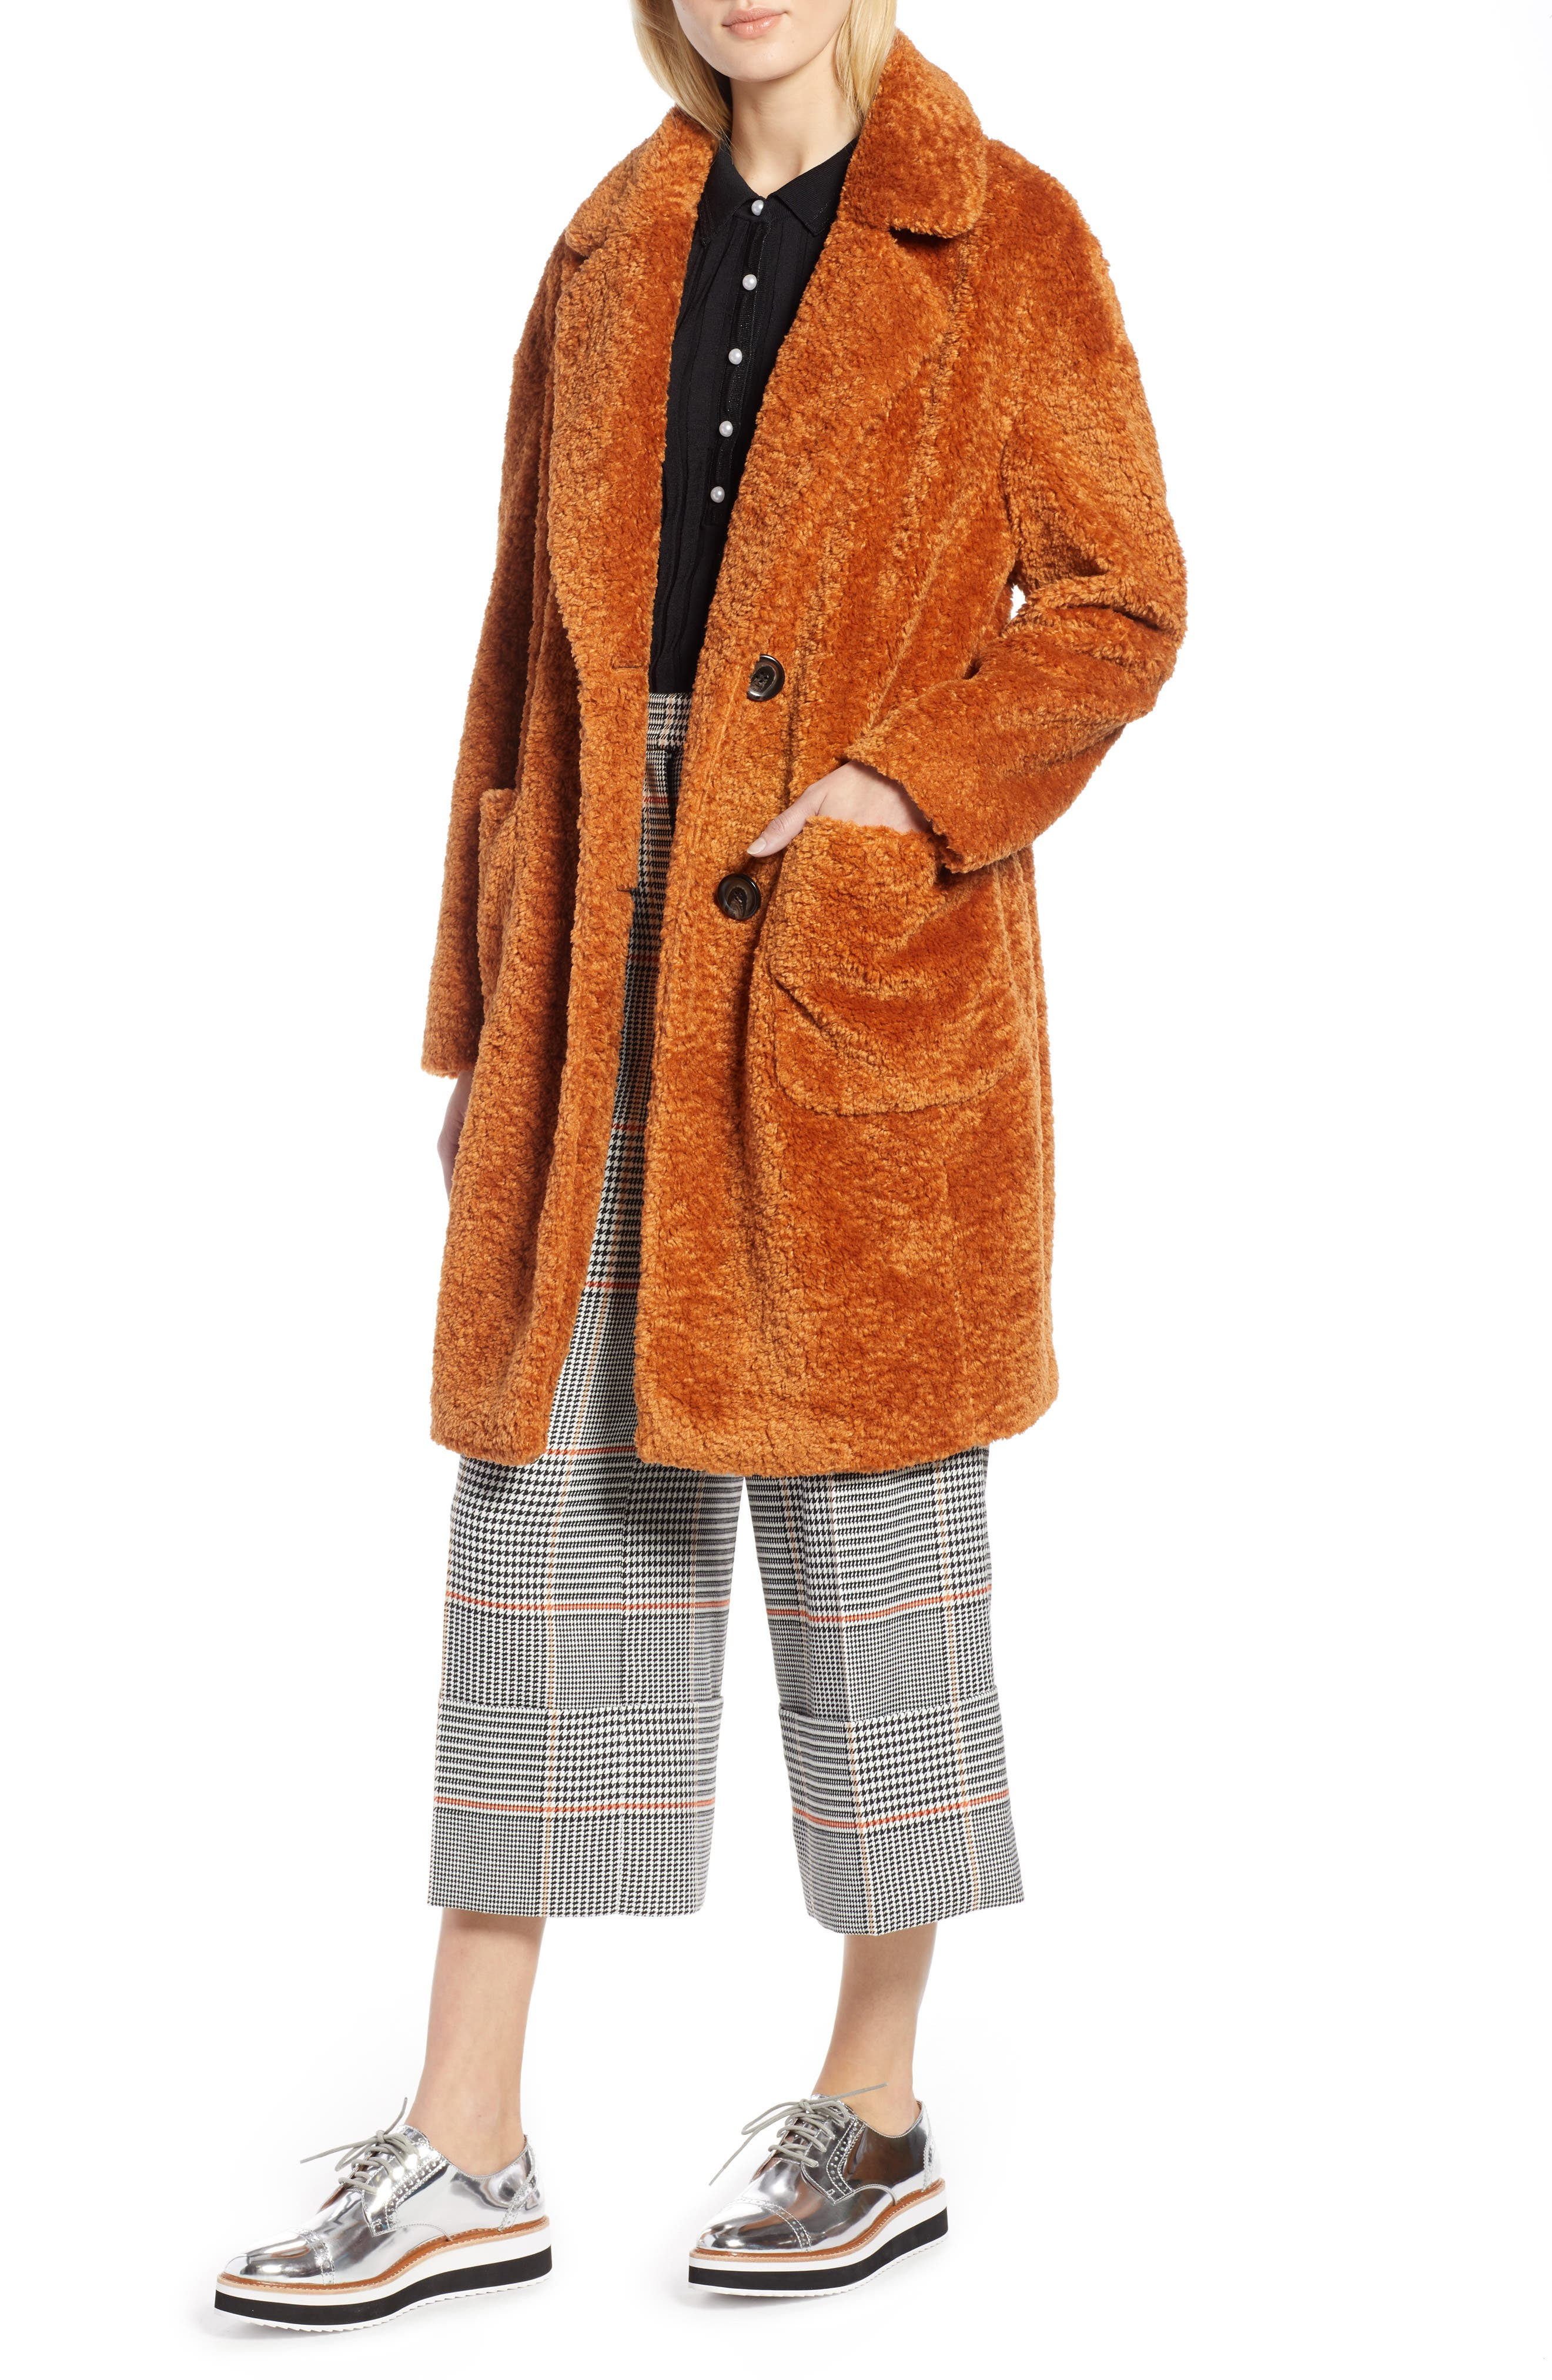 x Atlantic-Pacific Faux Fur Coat,                             Main thumbnail 1, color,                             RUST GINGER